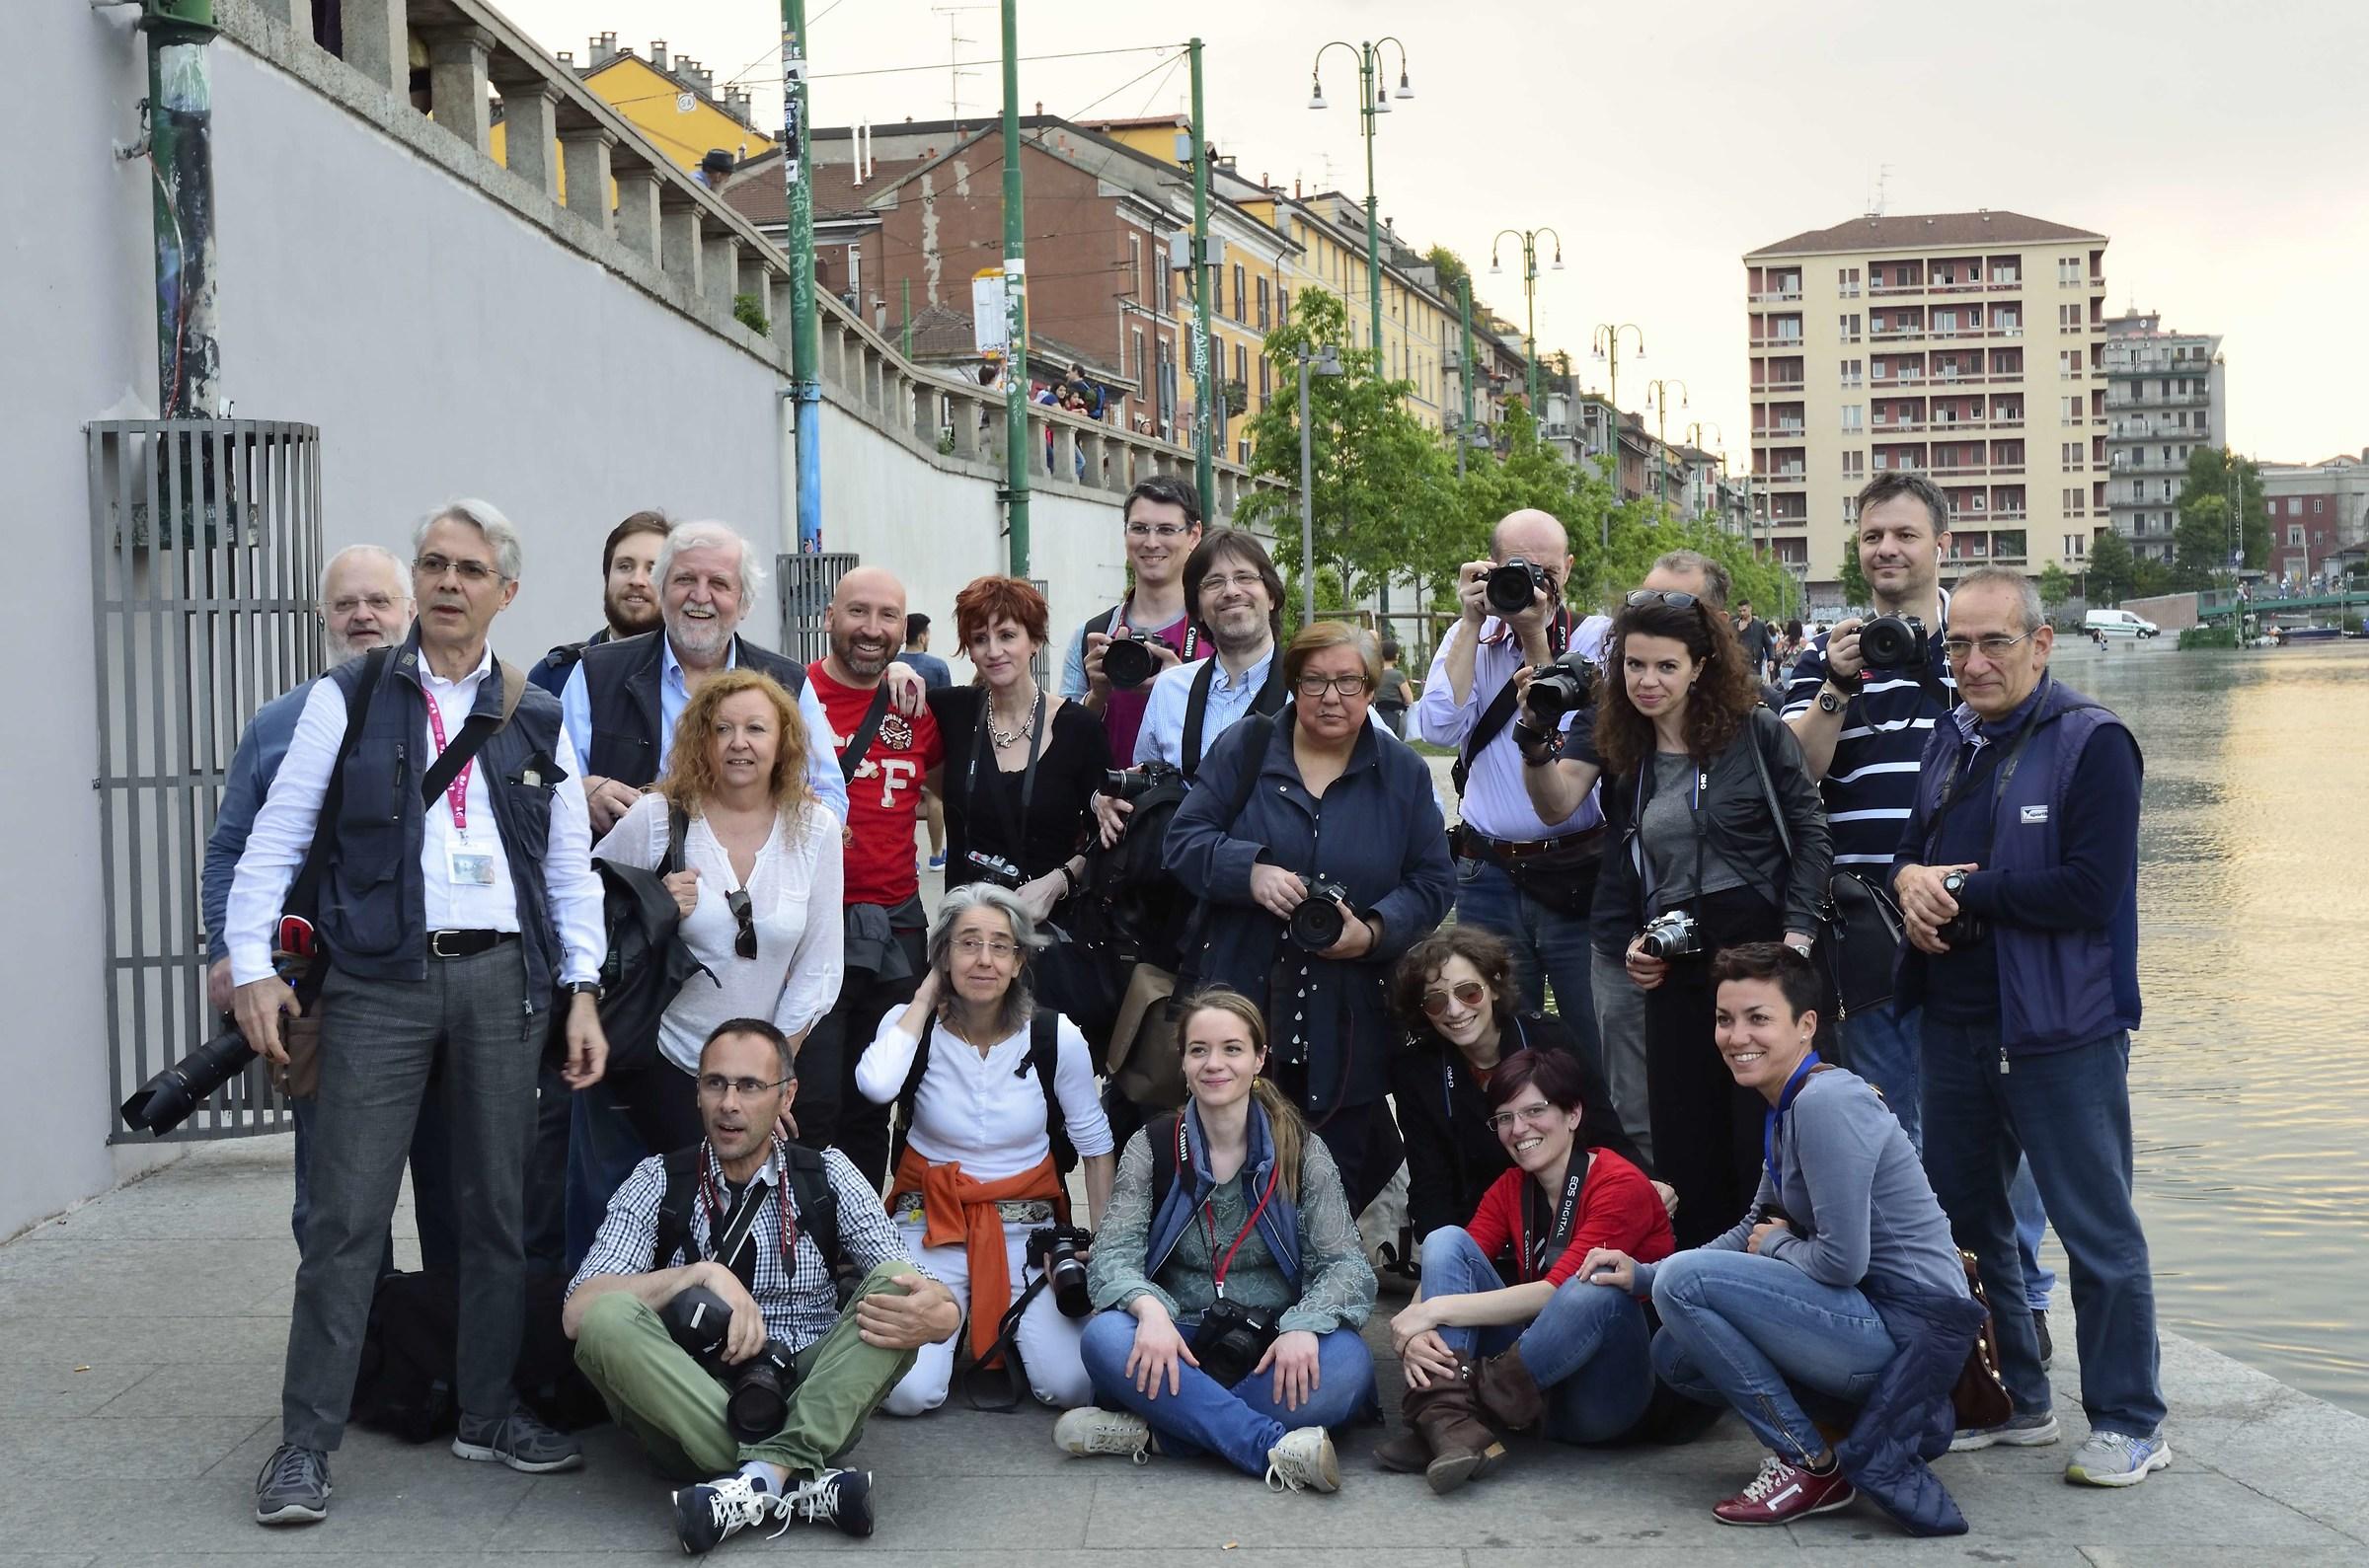 incontriamoci Group in Milan...